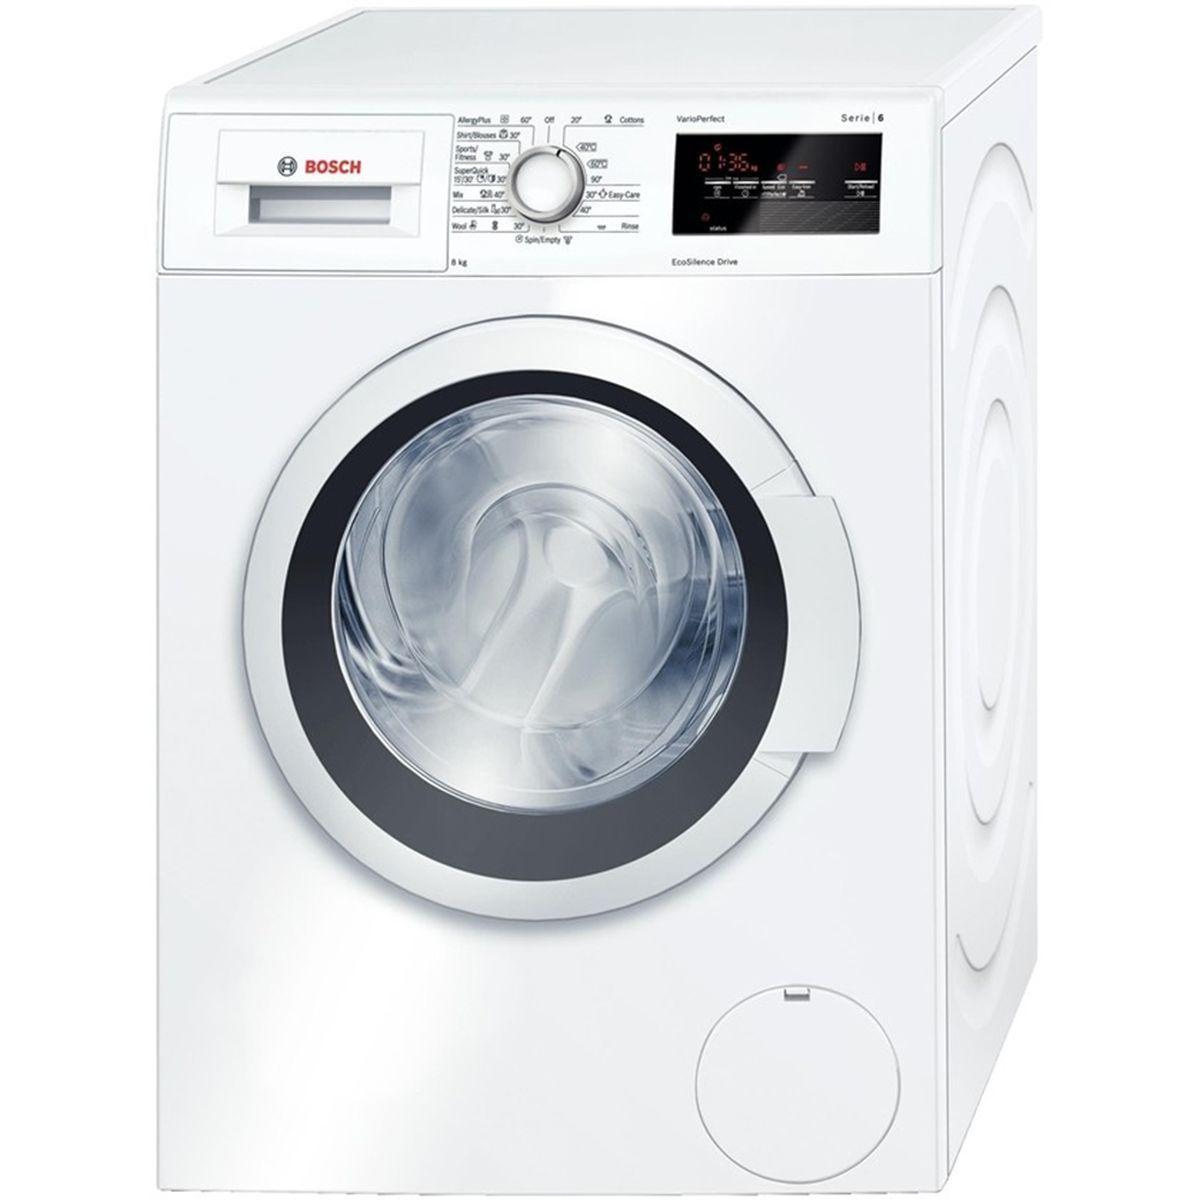 Washing Machine Or Tumble Dryer Pedestal Stand With Drawer Amazon Co Uk Large Appliances Buy Washing Machine Washing Machine Dryer Washing Machine